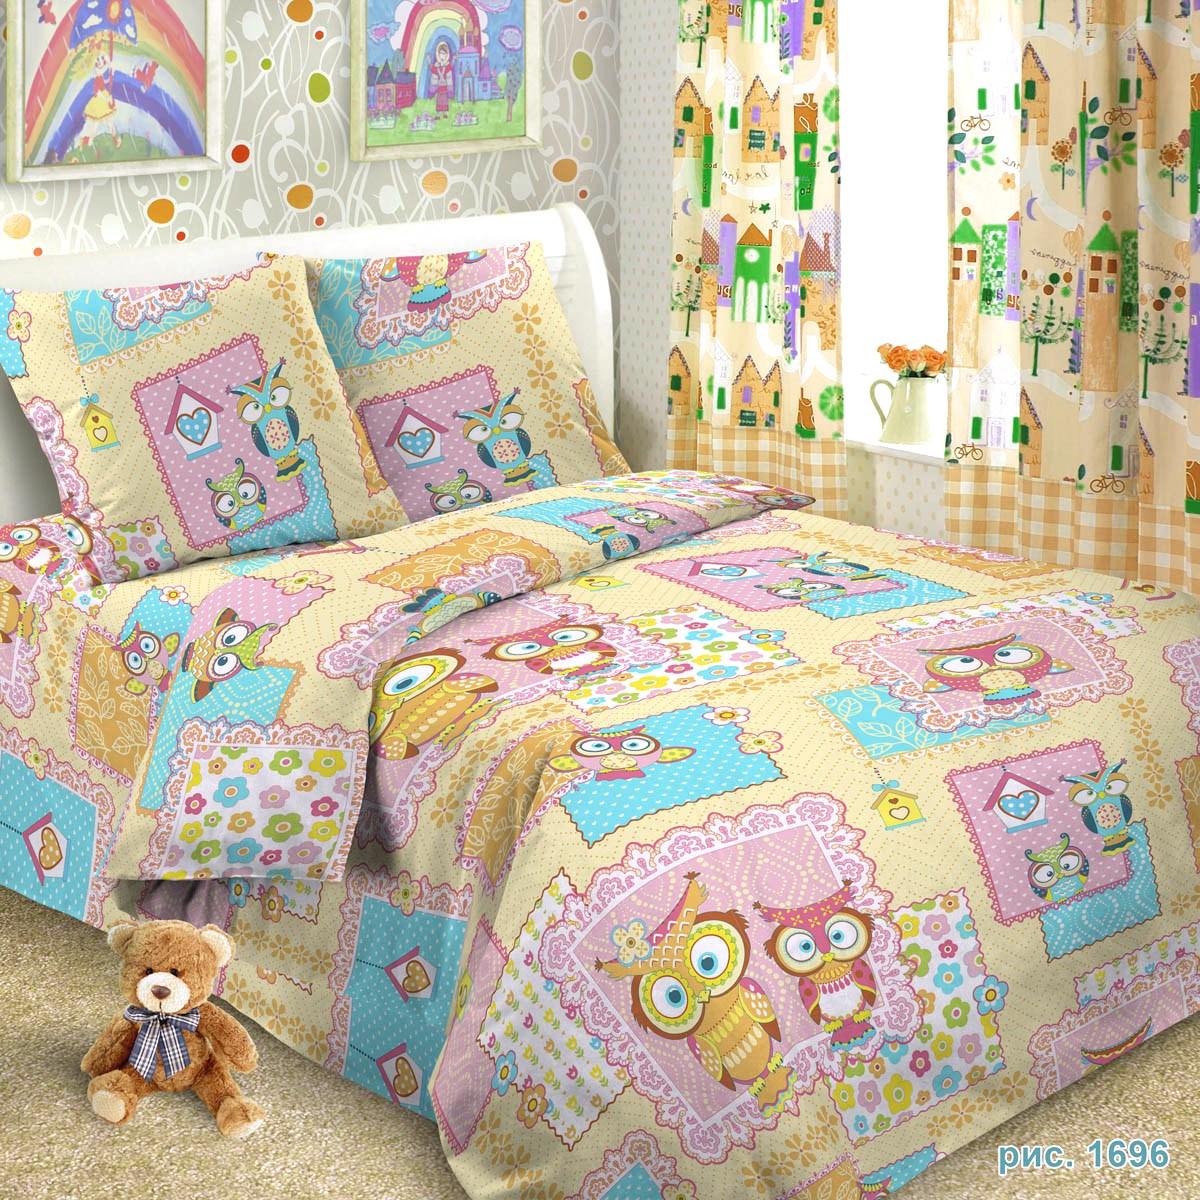 Letto Комплект детского постельного белья Сова 3 предмета, Letto Home Textile